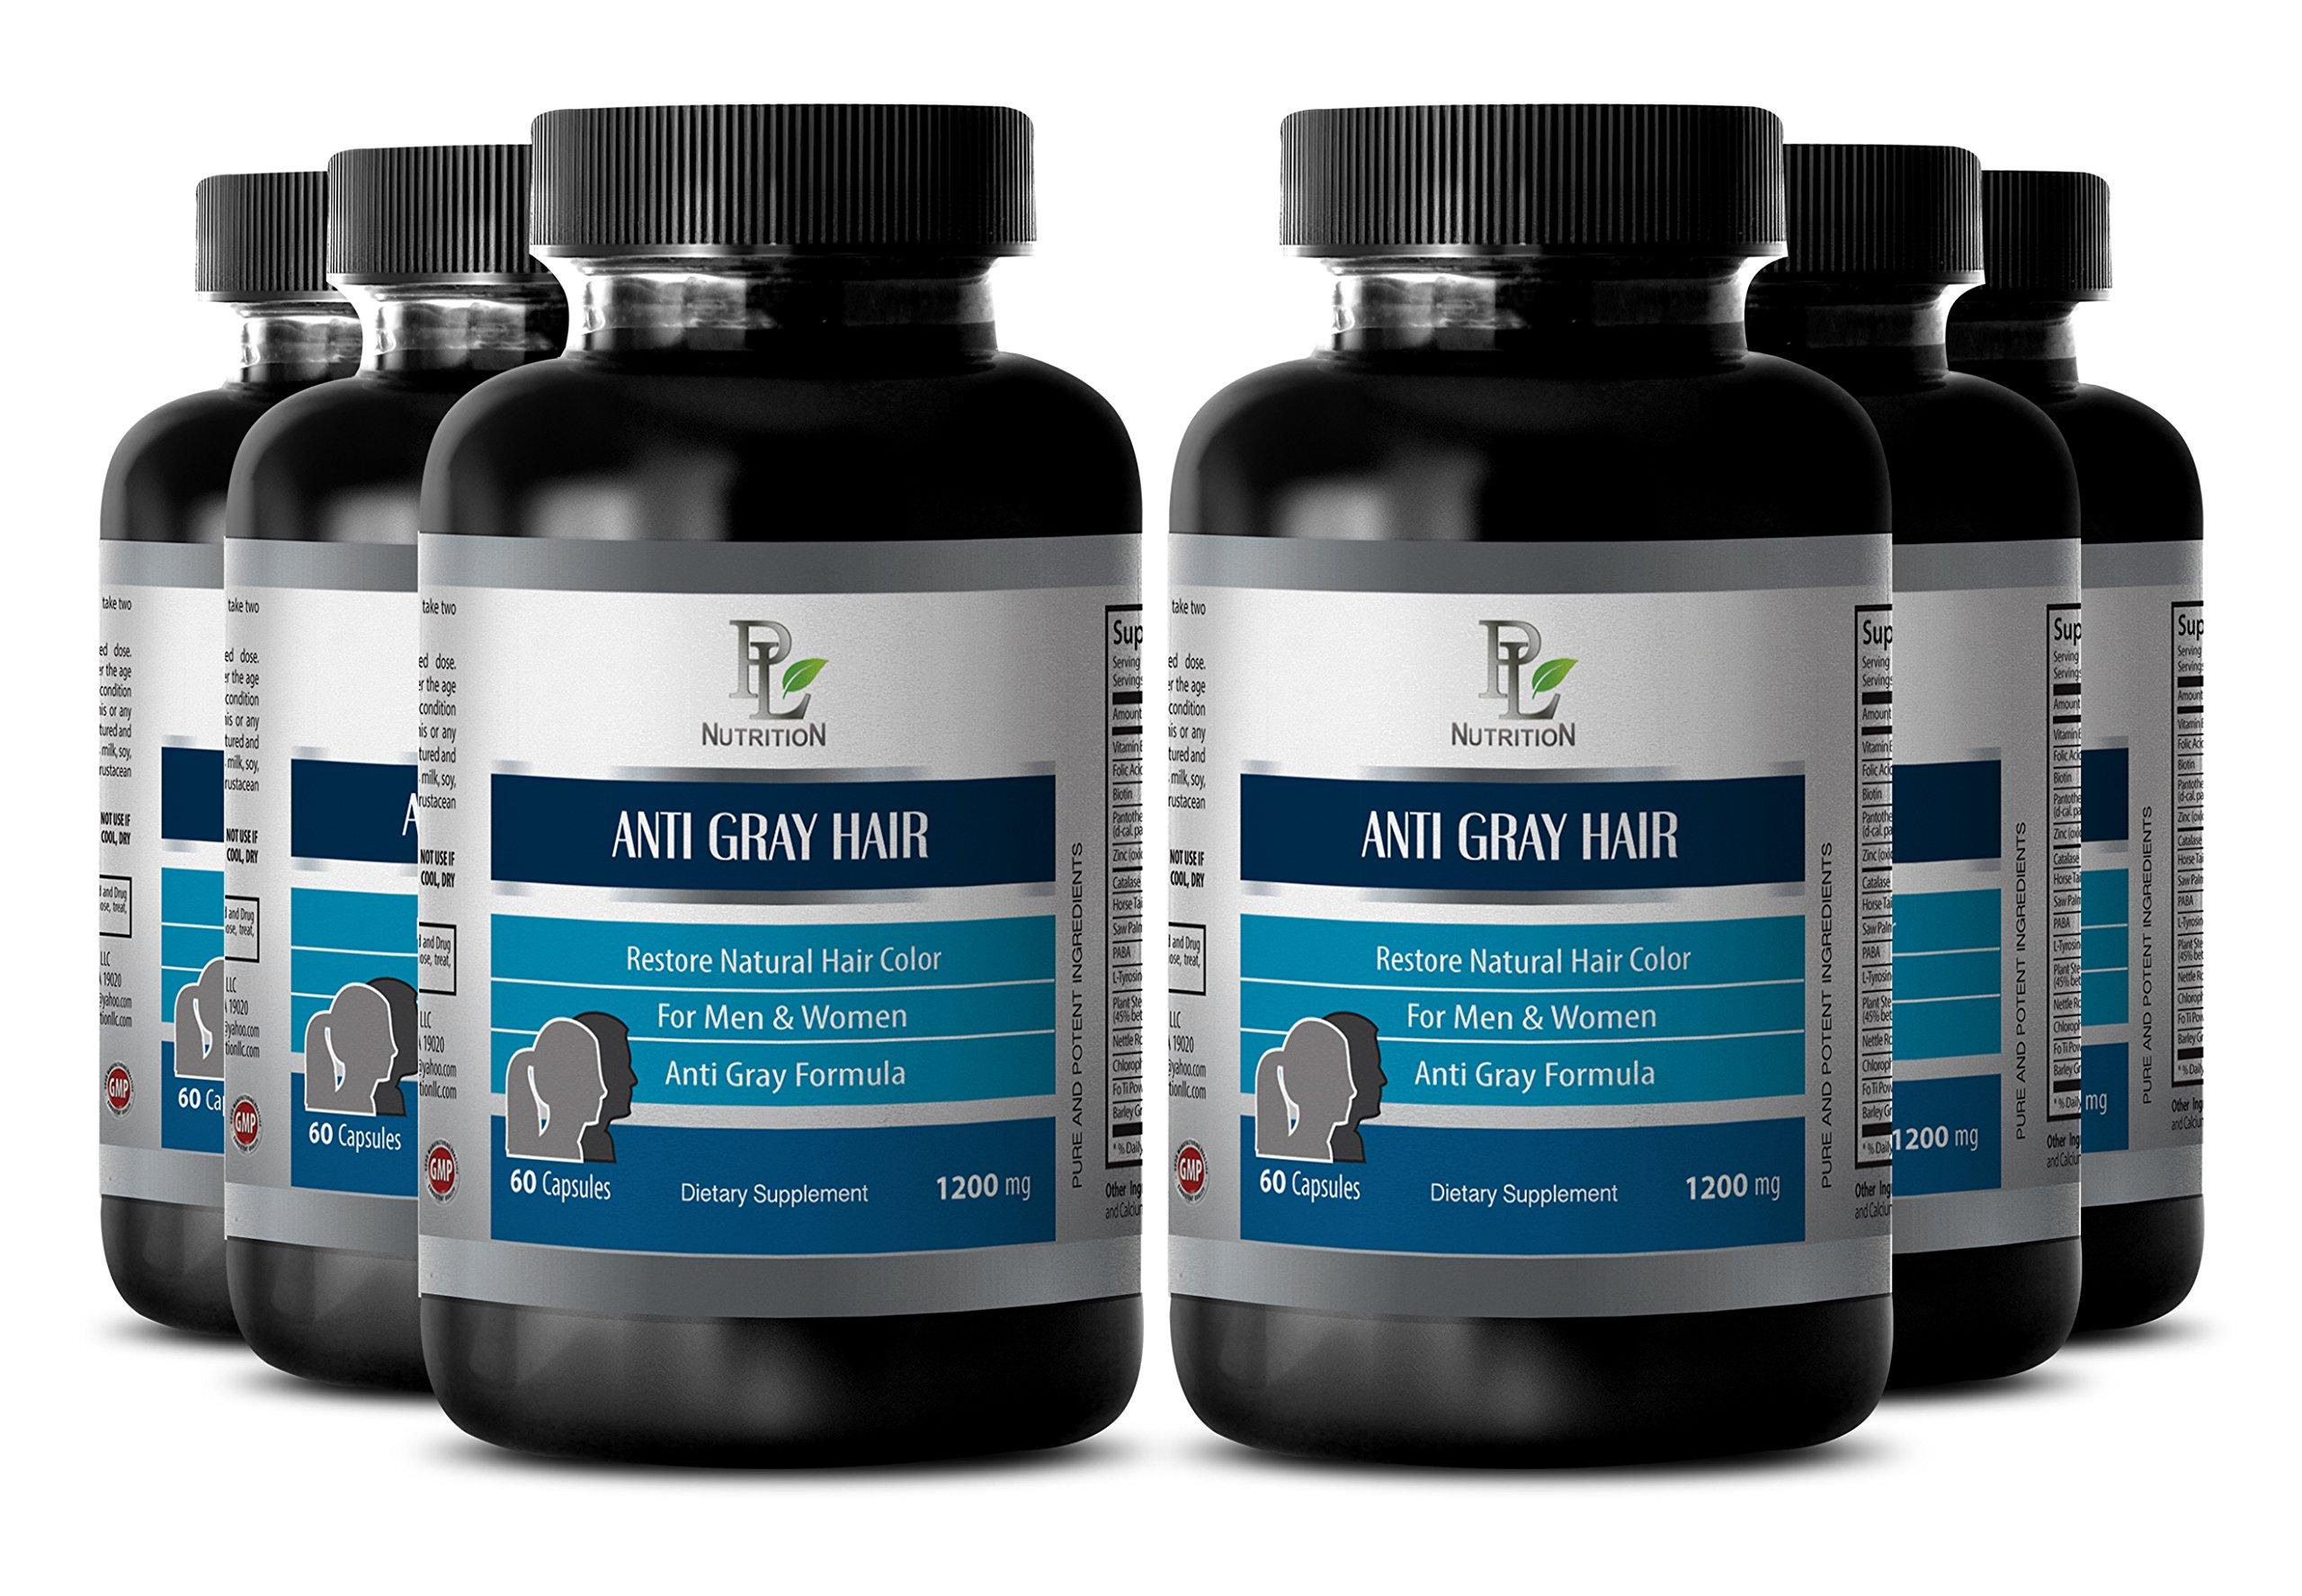 Increase hair thickness - ANTI GRAY HAIR NATURAL COMPLEX 1200mg - Barley grass juice powder - 6 Bottles 360 Capsules